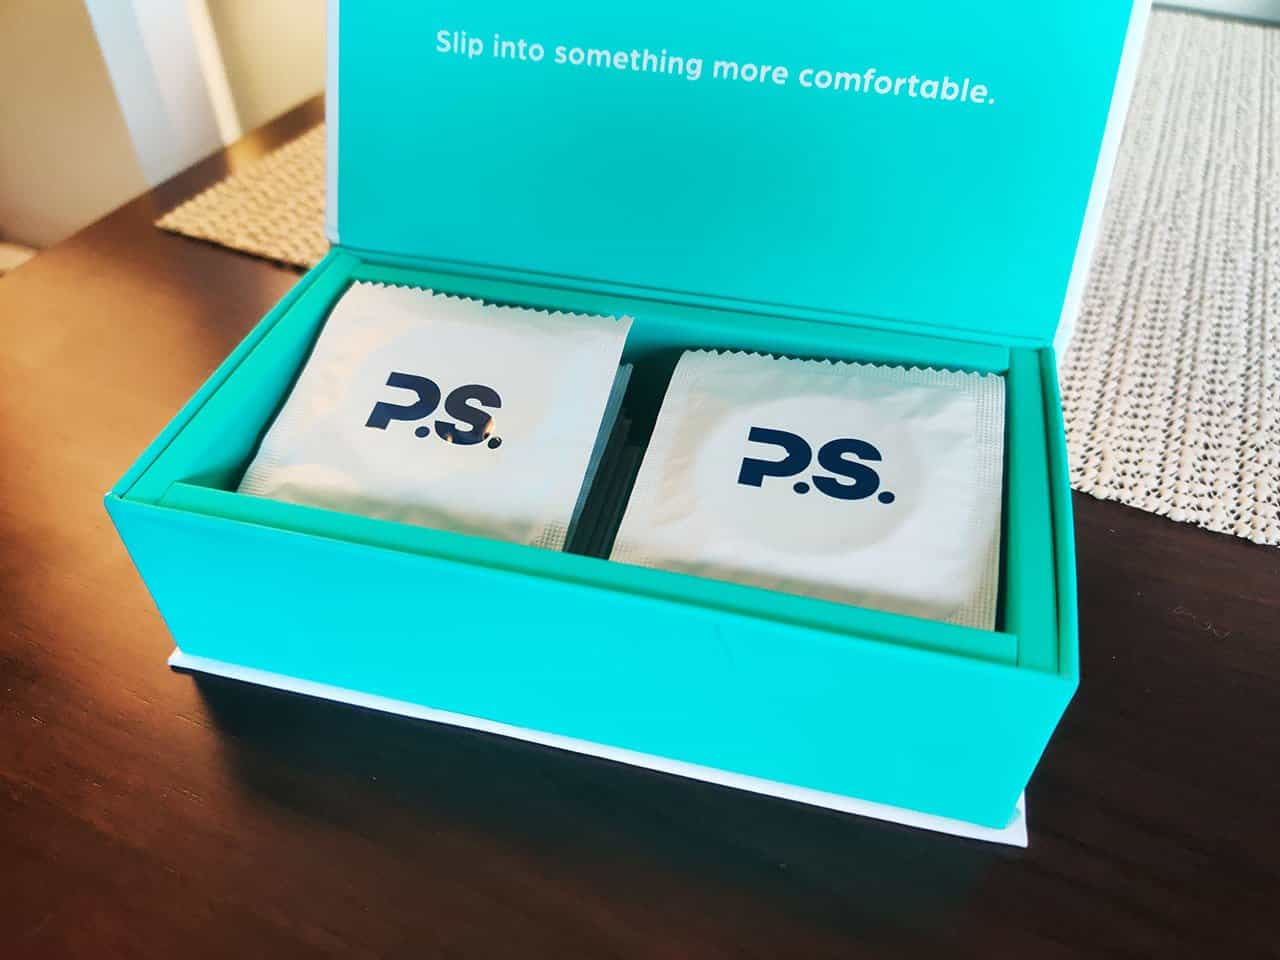 ps condoms in a box